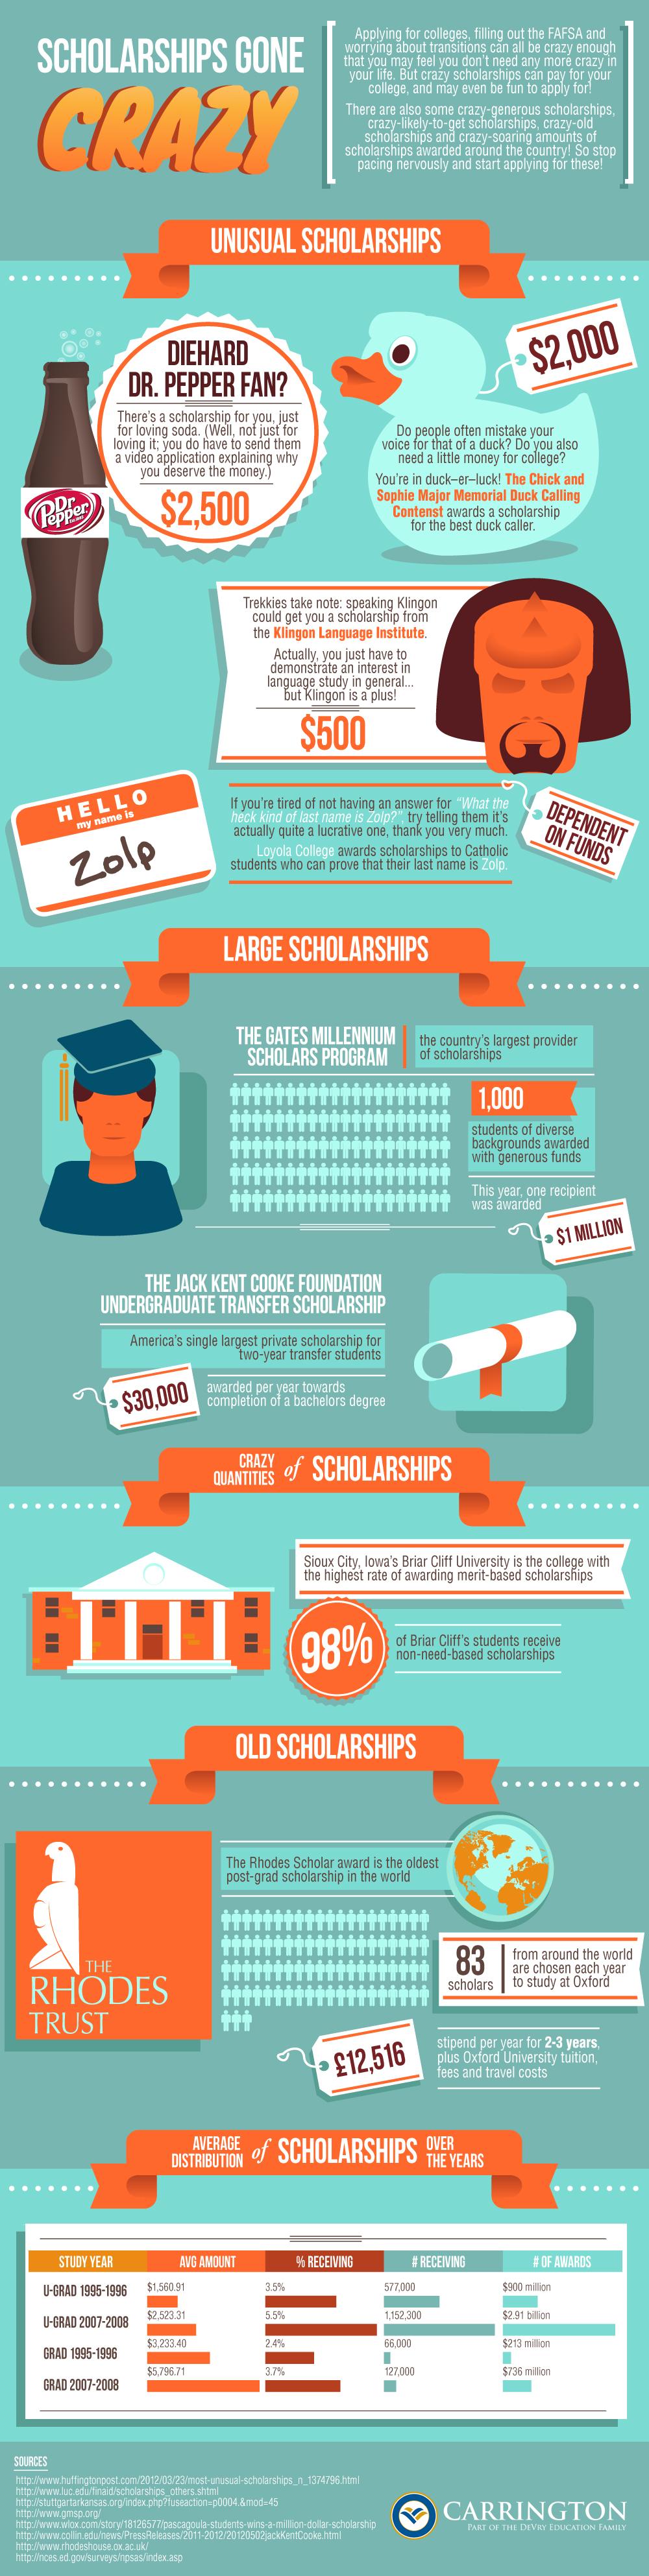 crazy-scholarships-infographic-1